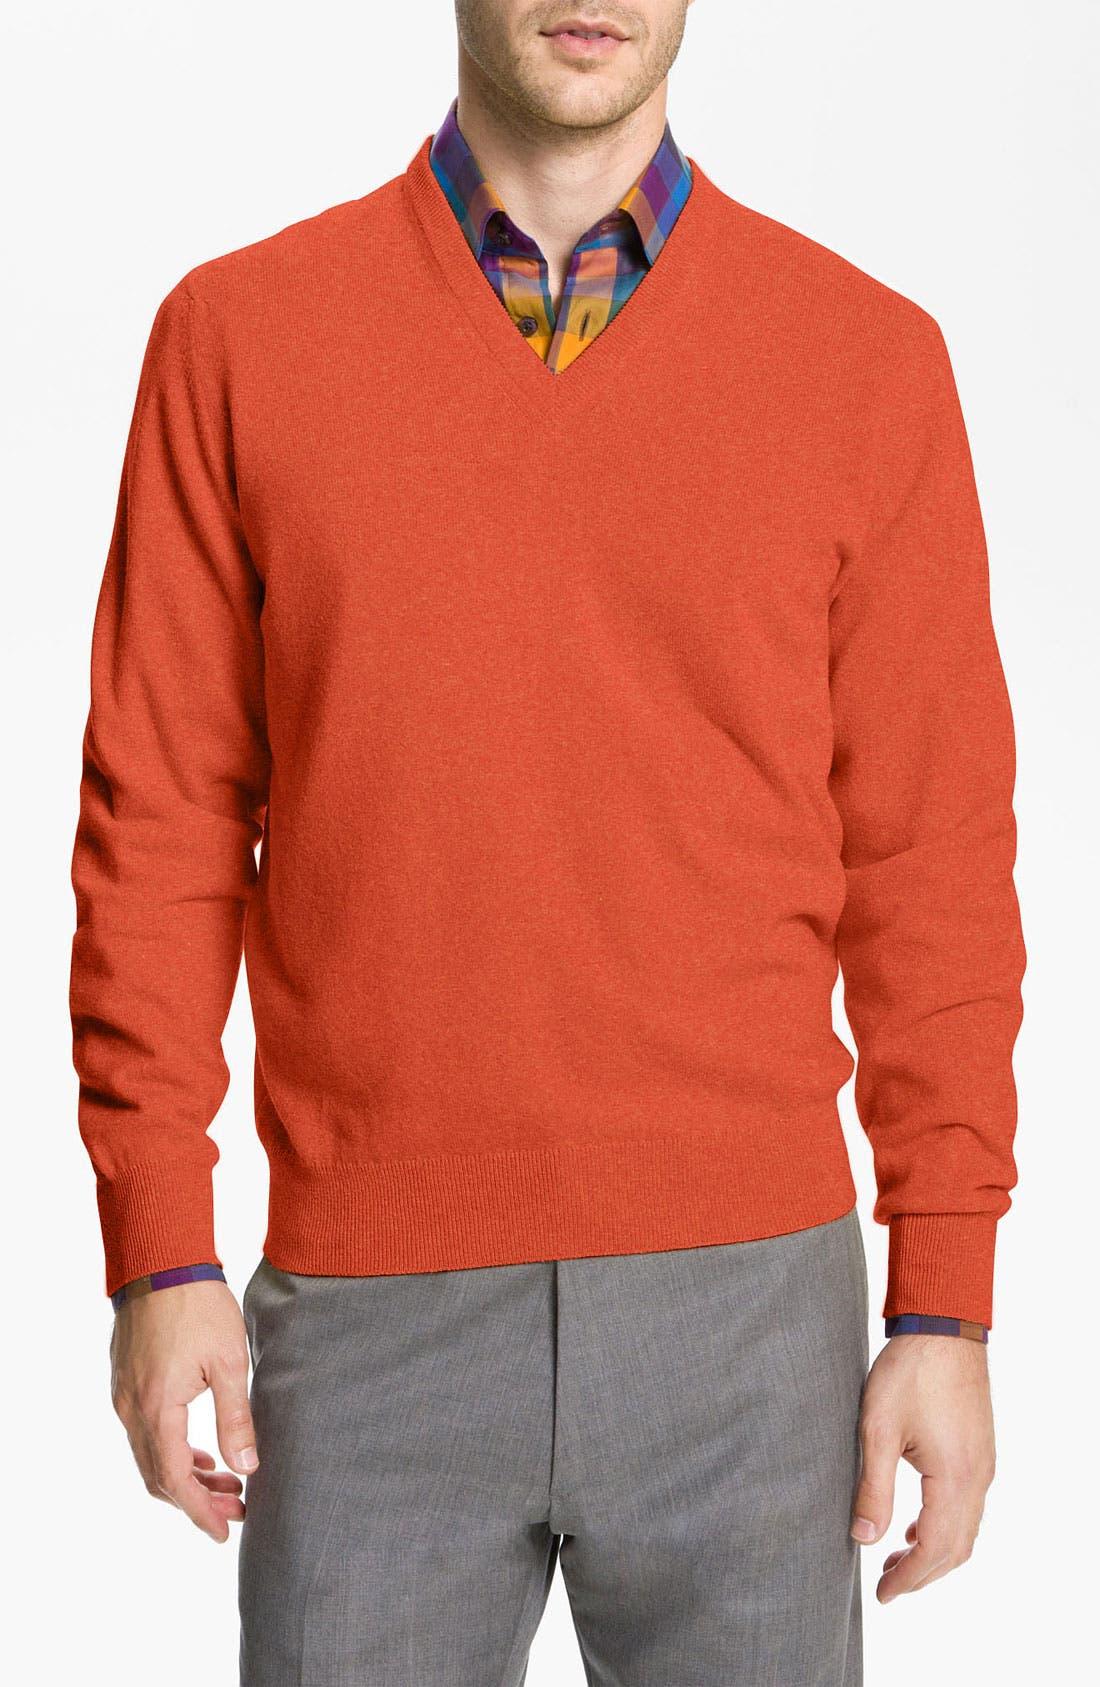 Alternate Image 1 Selected - MacAlan V-Neck Cashmere Sweater